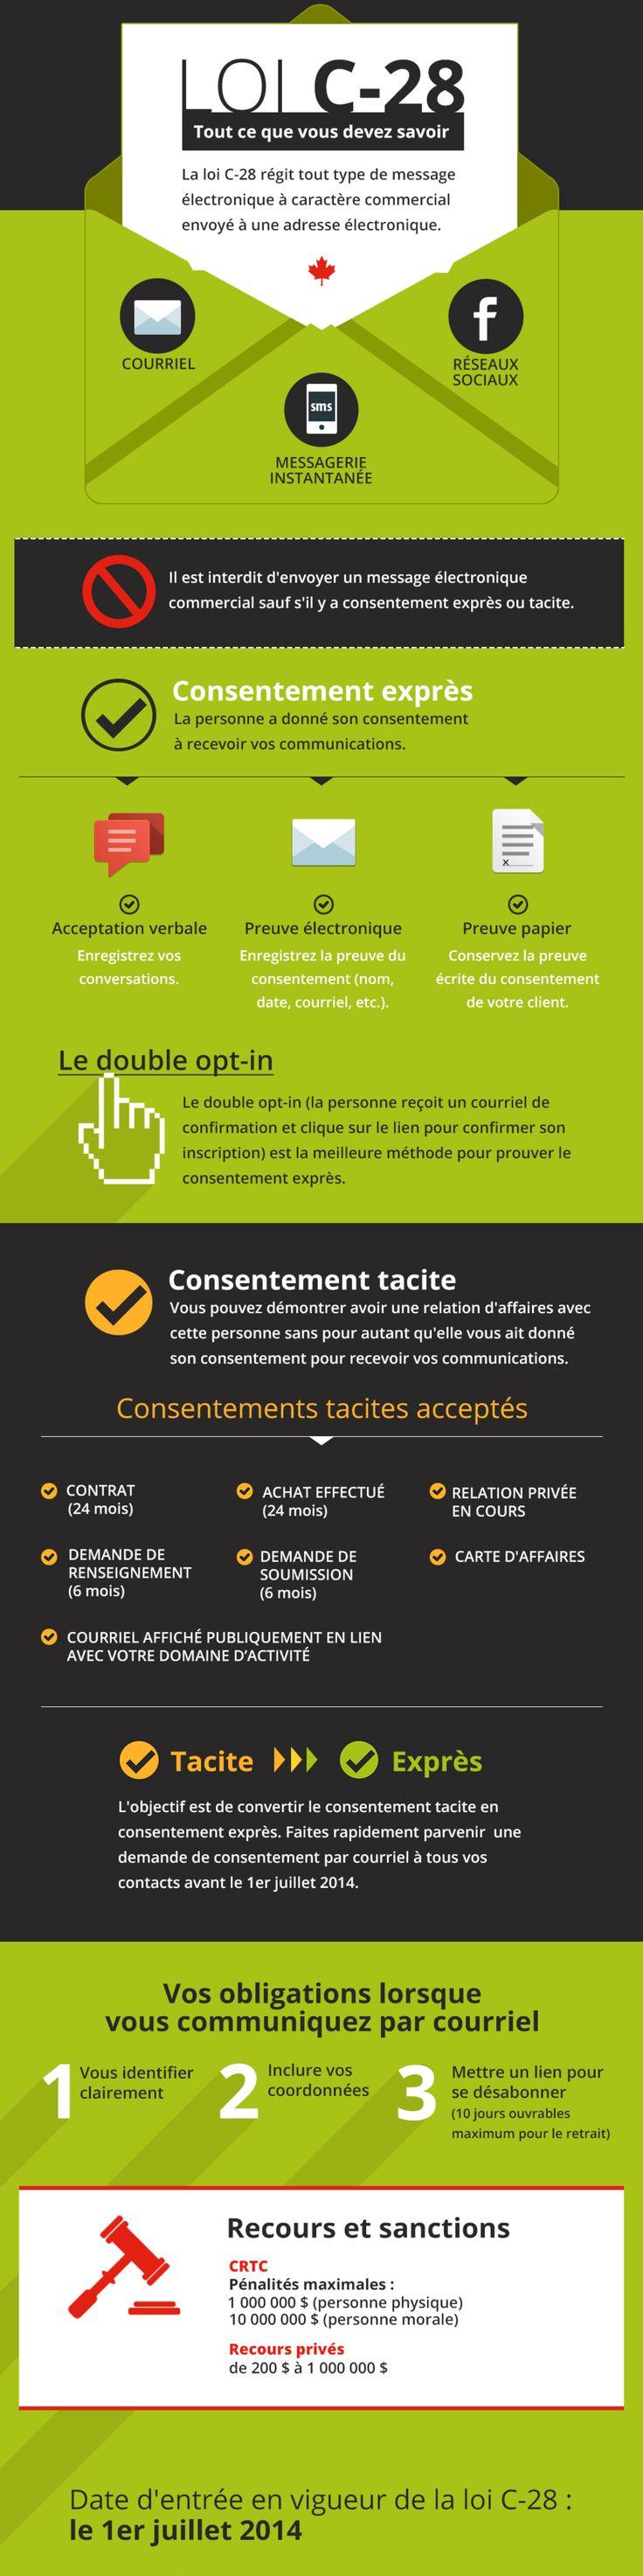 Loi C-28 anti-pourriel : infographie